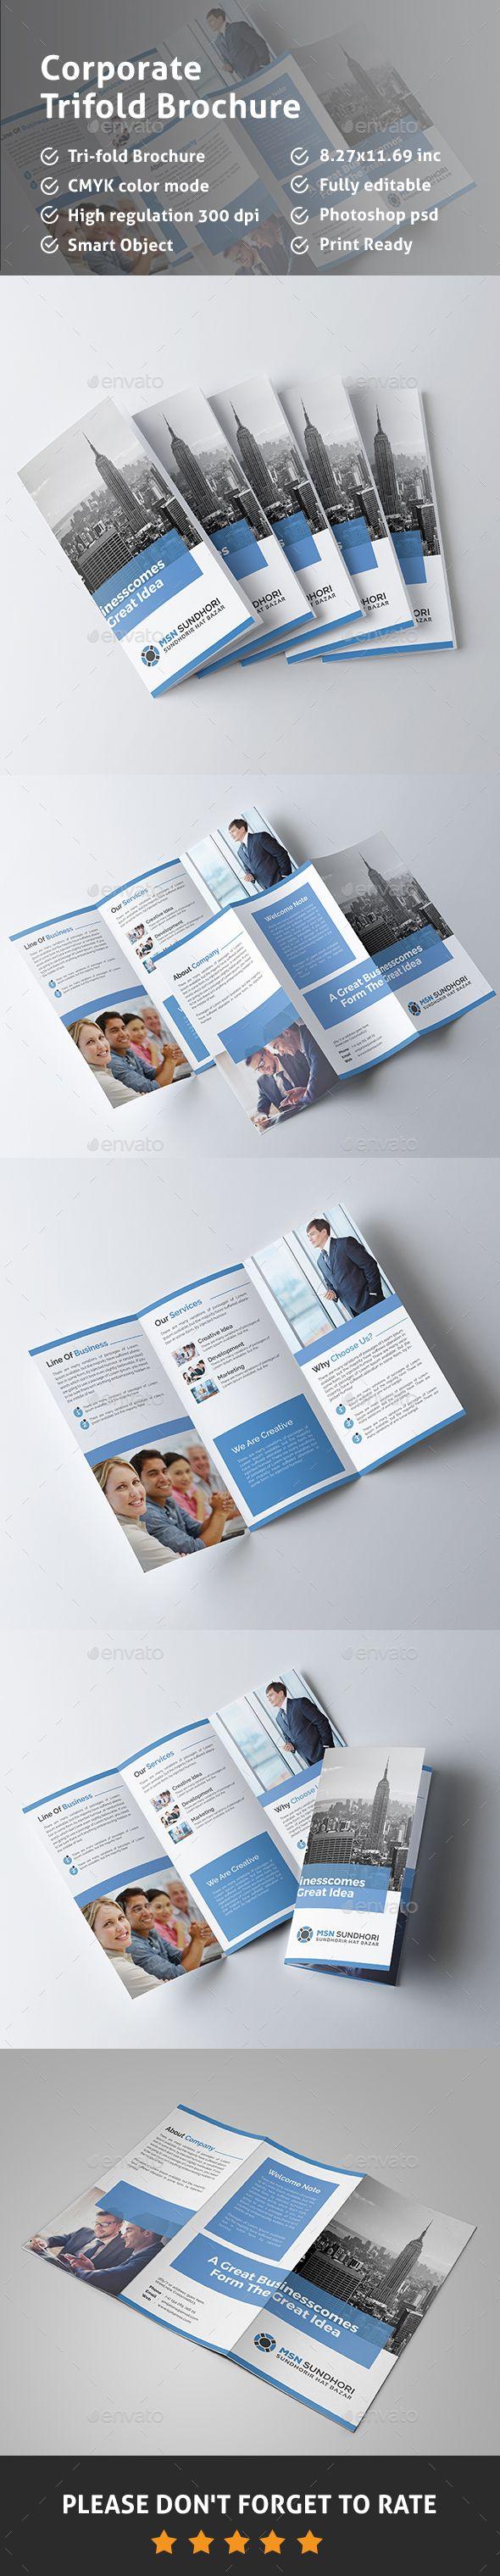 Tri-fold Brochure Template PSD. Download here: http://graphicriver.net/item/trifold-brochure/15455705?ref=ksioks